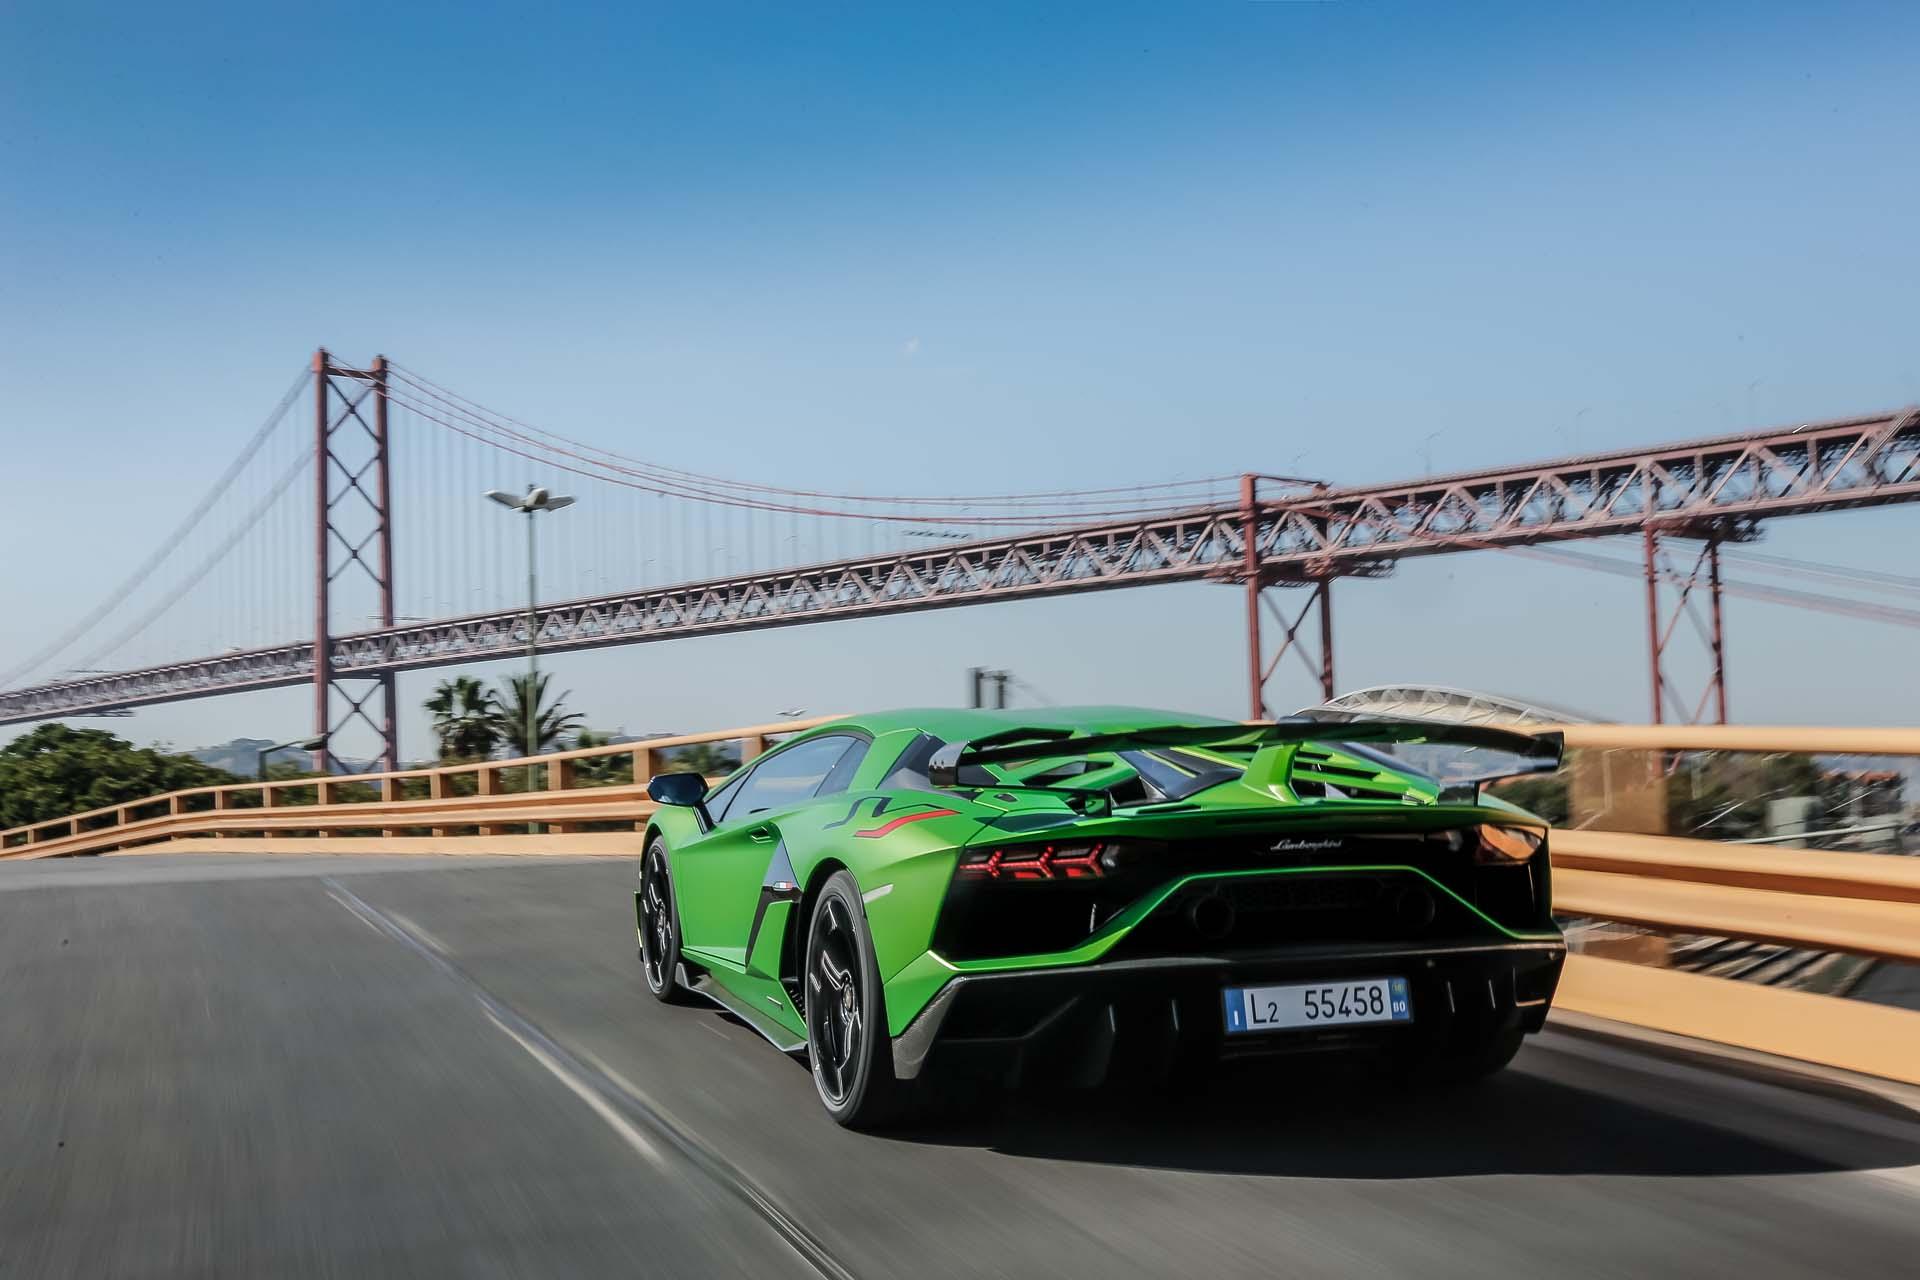 2019 Lamborghini Aventador SVJ Rear Three-Quarter Wallpapers #49 of 241